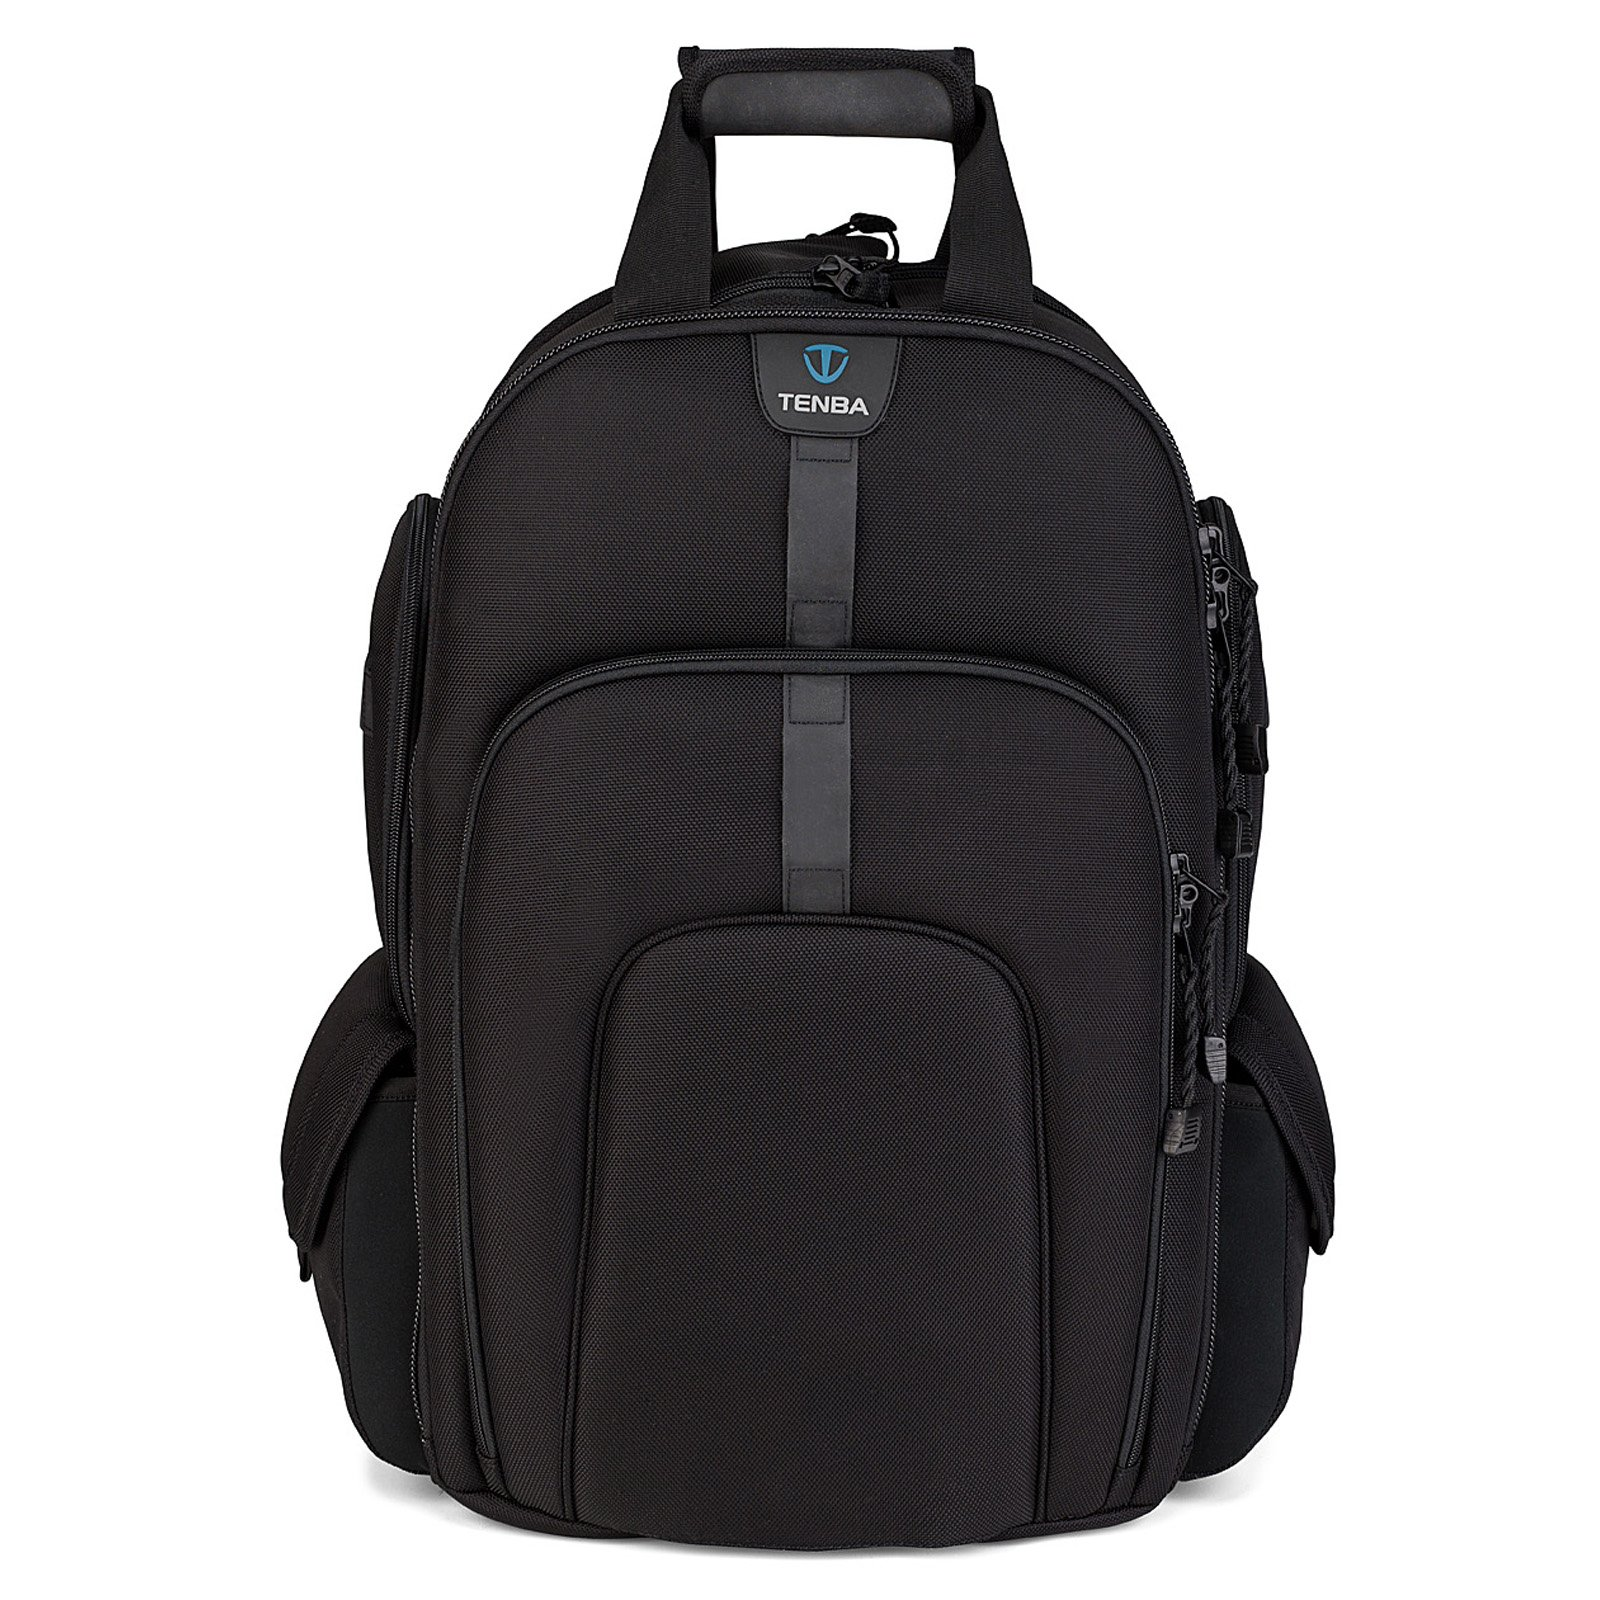 Tenba HDSLR/Video Backpack 20in (638-318)